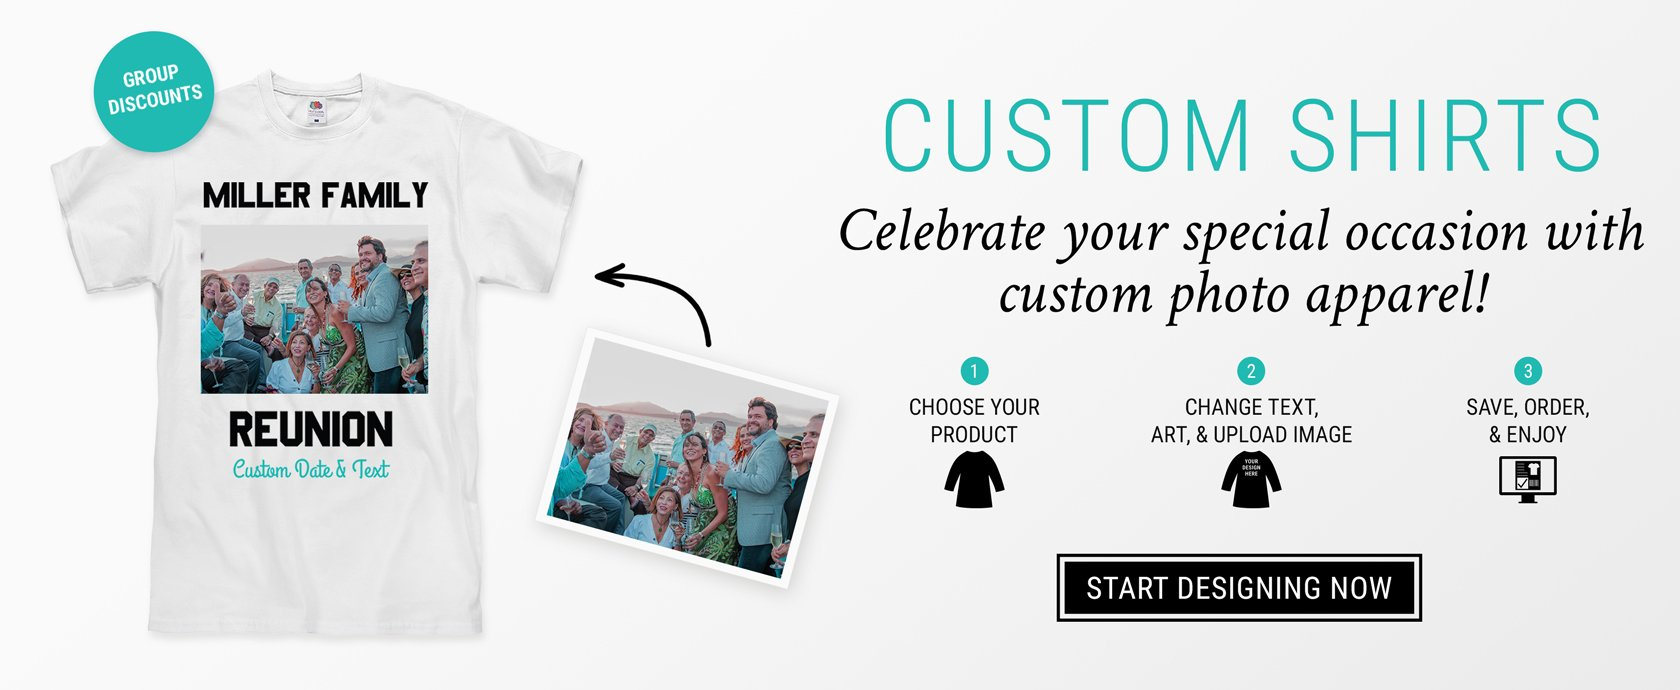 63e056275f4c7 Customized Girl - Custom Shirts, Tanks, Undies, & More